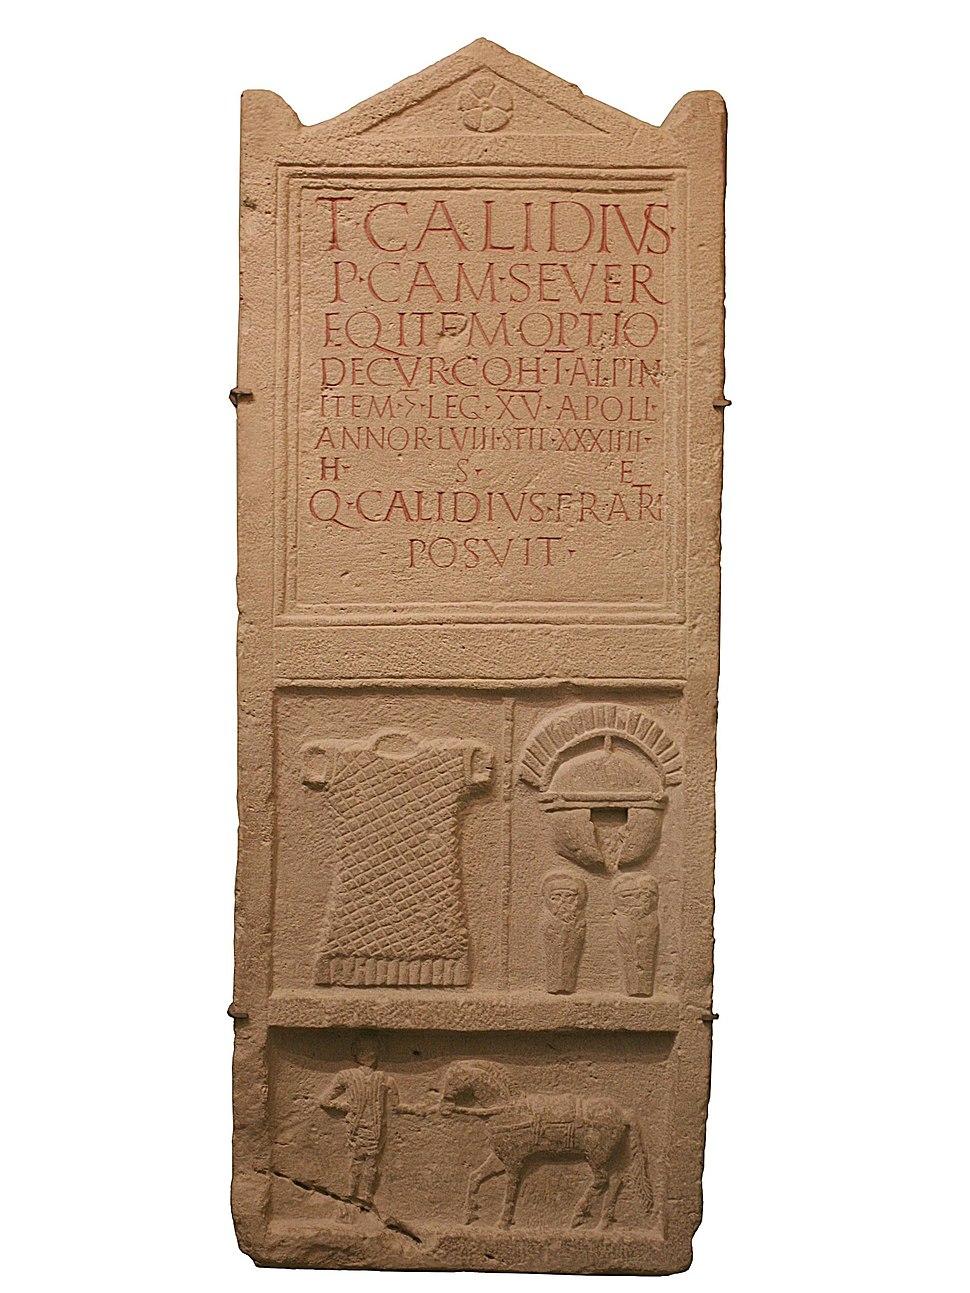 Grabstein Titus Calidius Carnuntum